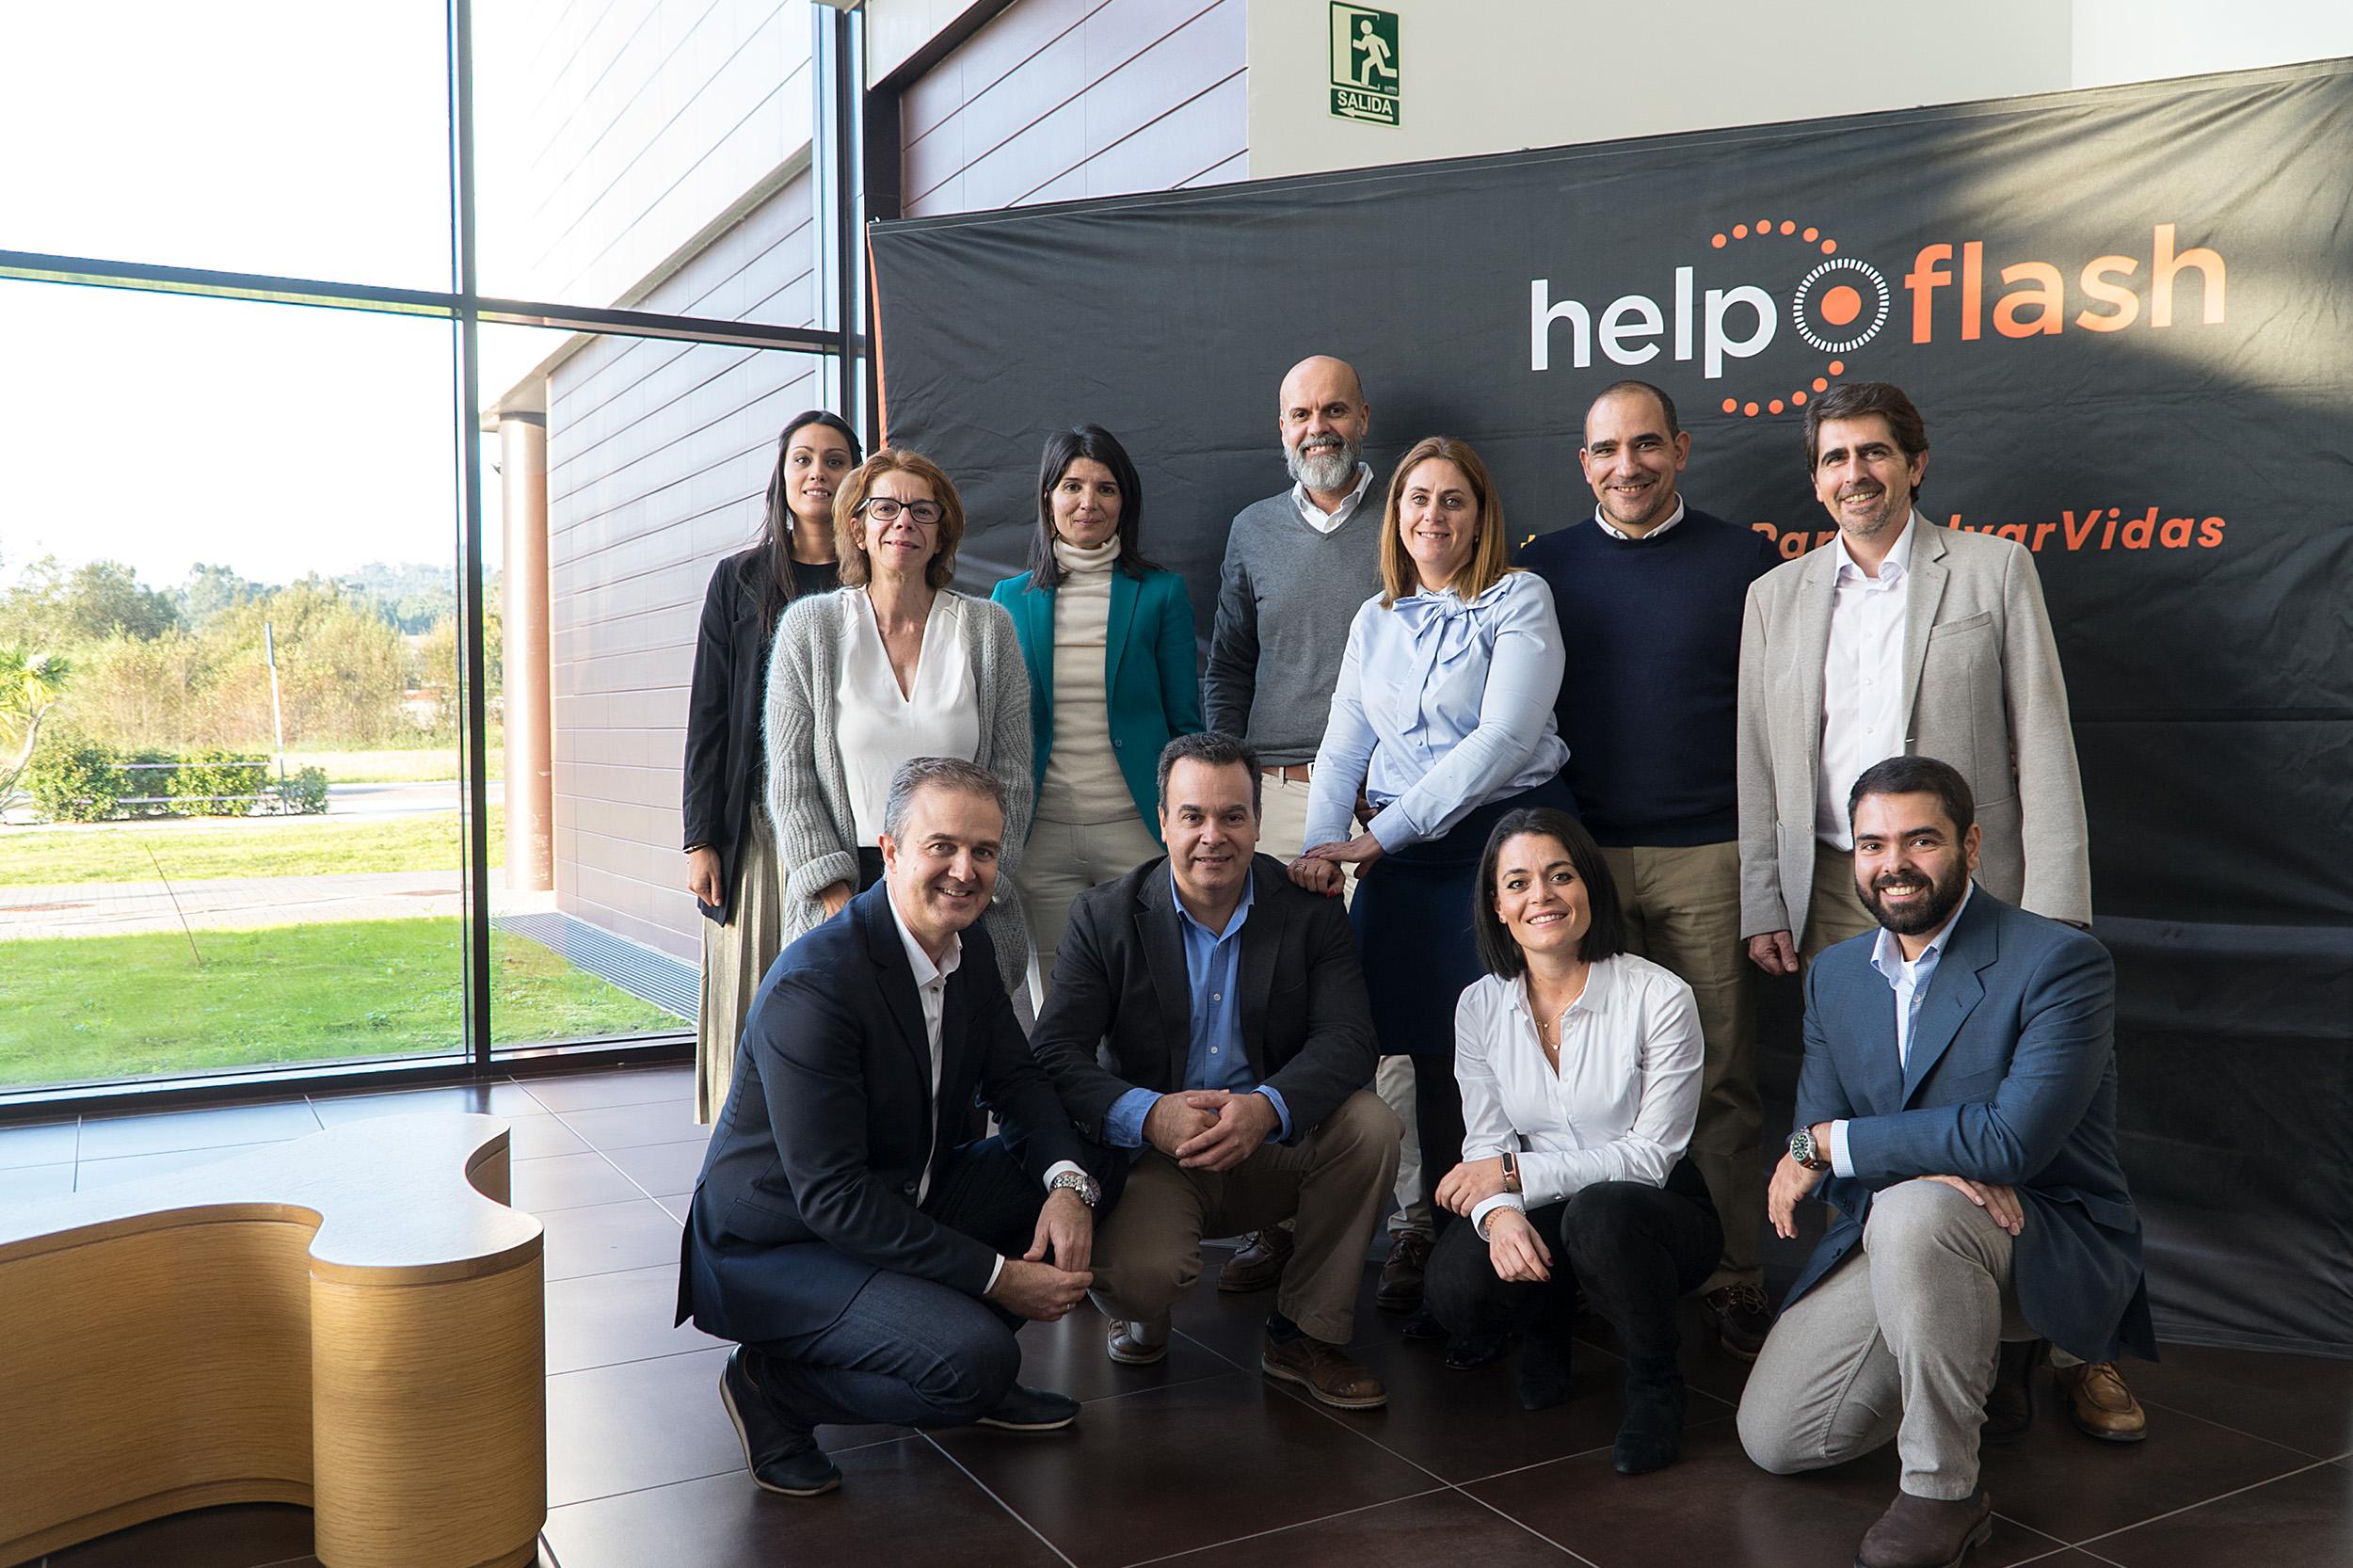 Help-flash-Team-Vigo